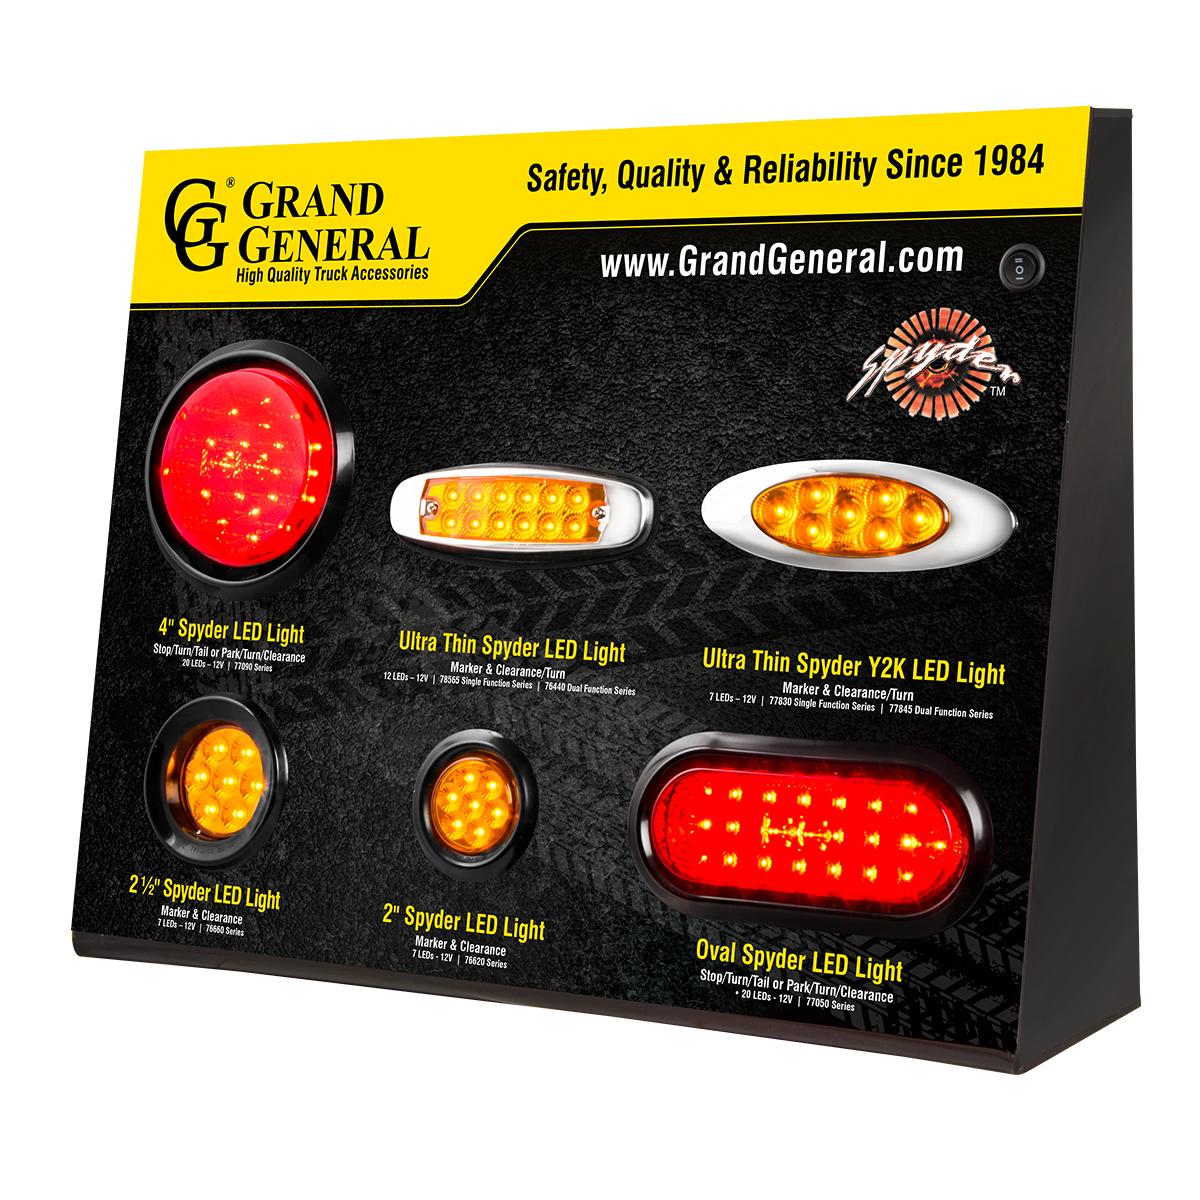 Spyder LED Series Light Display